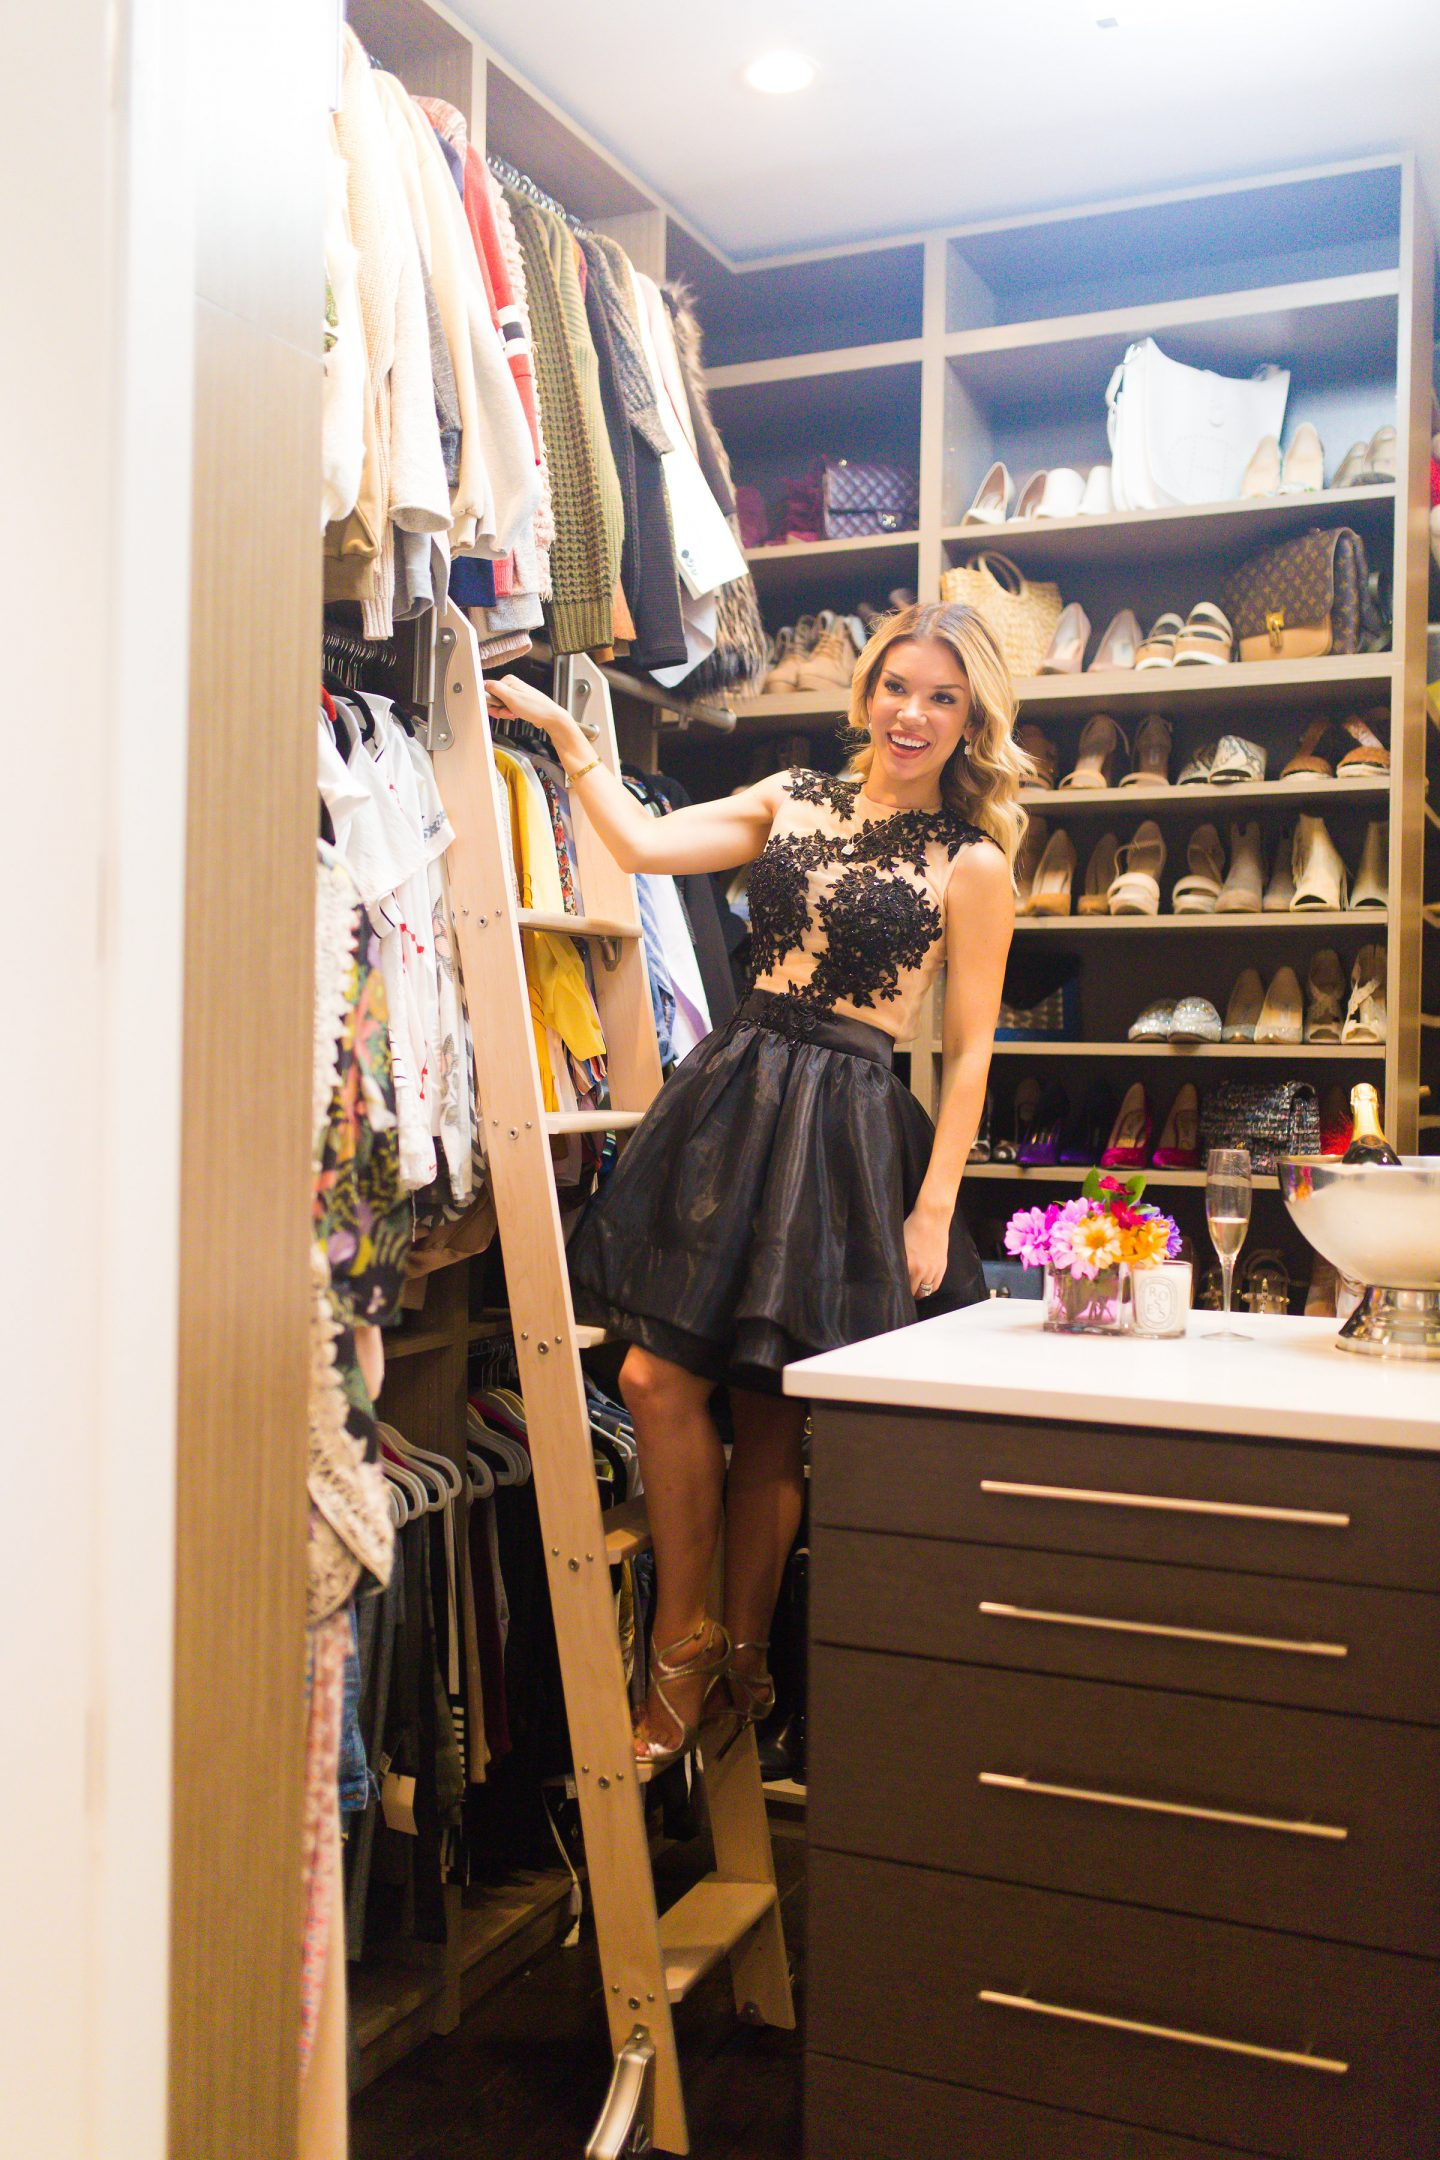 chicago blogger, dr. Michael horn, closet tour, closet organizing